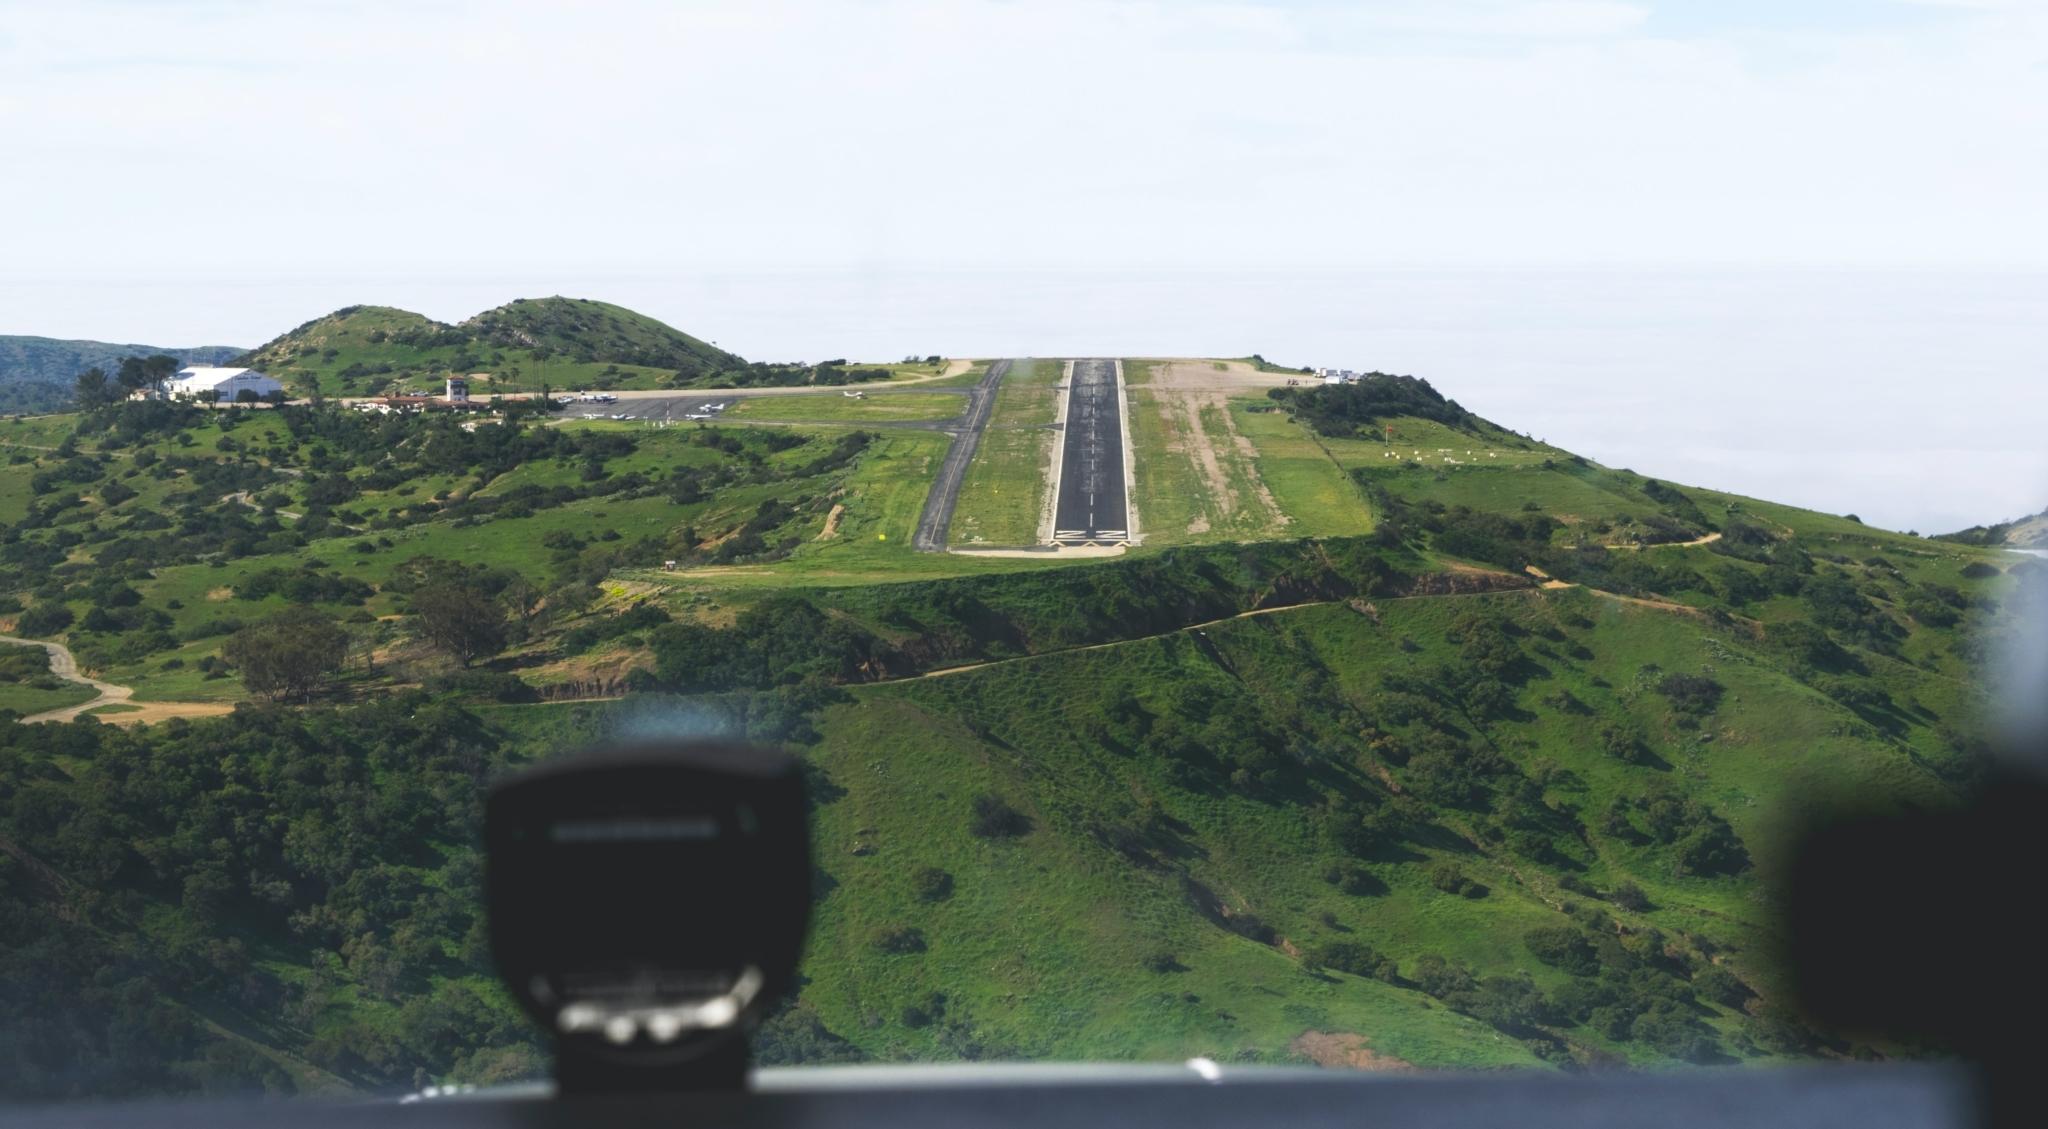 Mountain airport runway